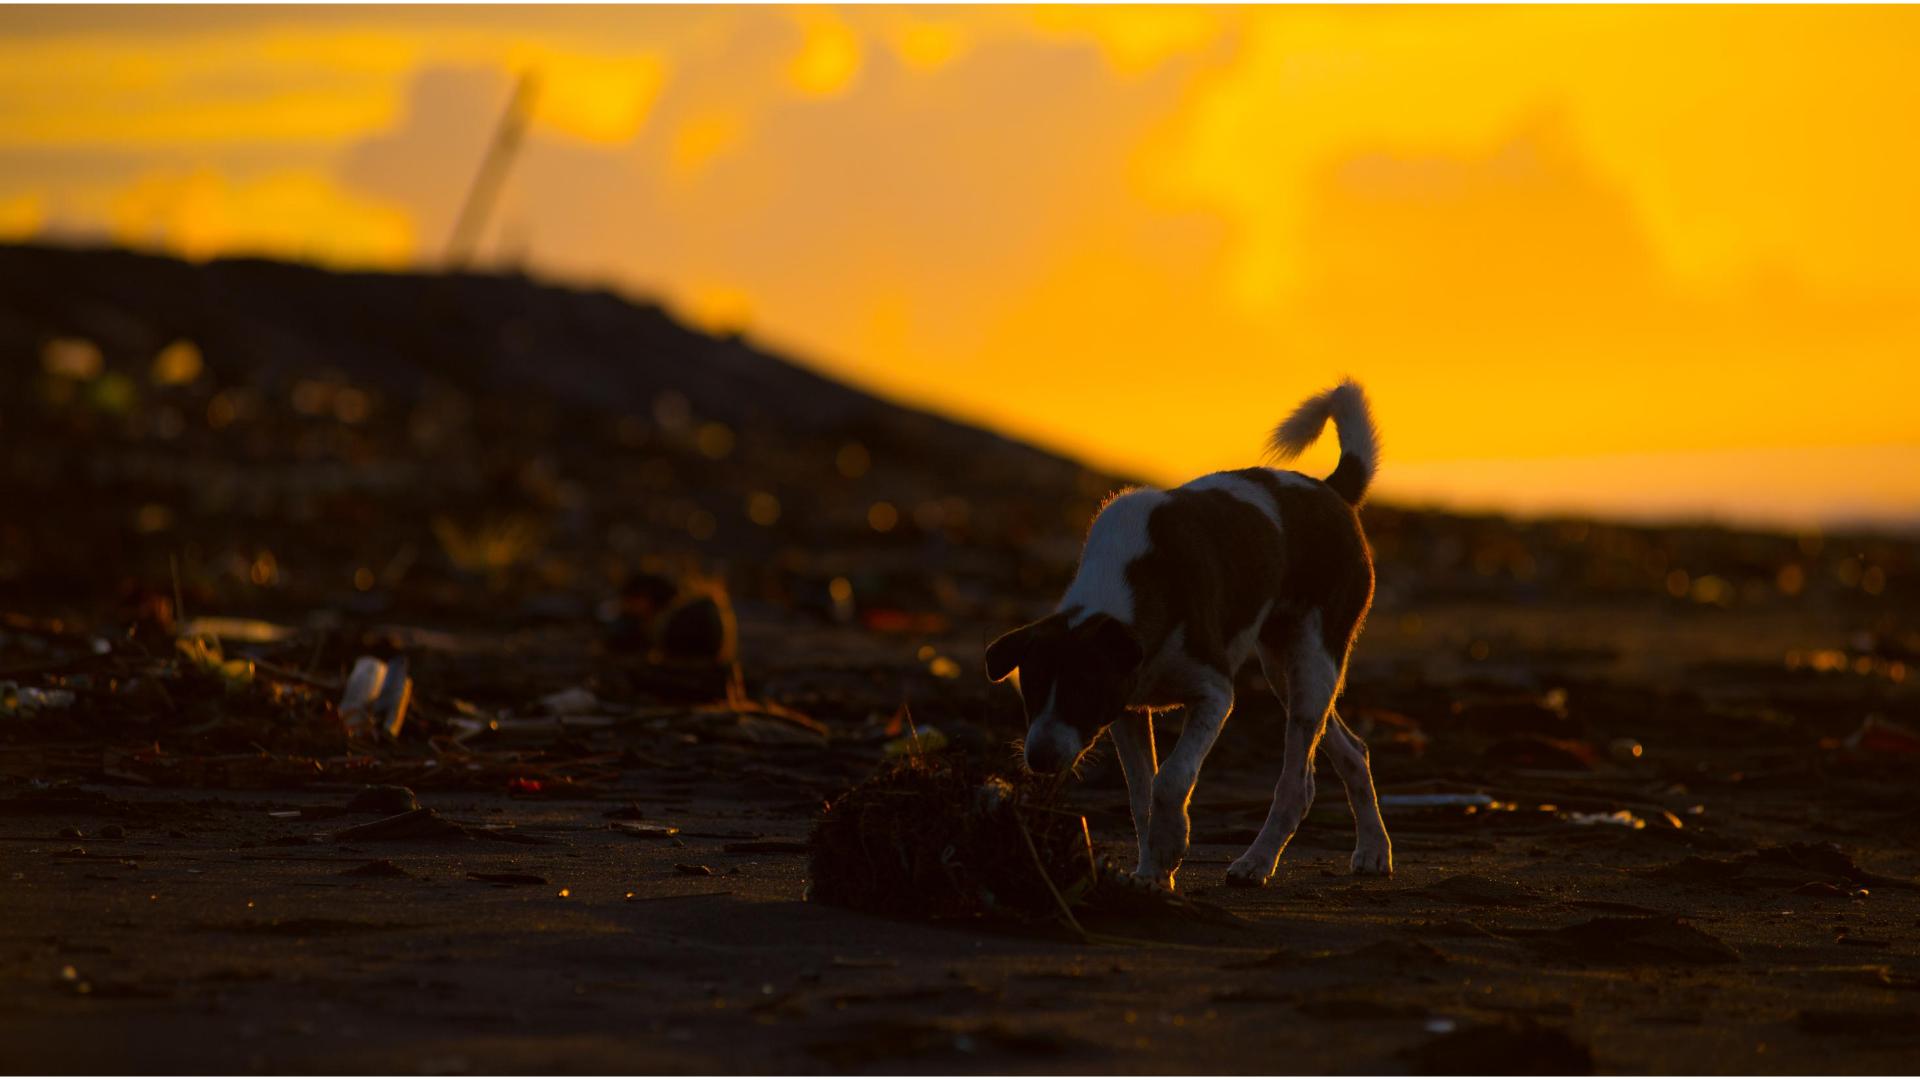 Bali Dog searching Food on the Beach